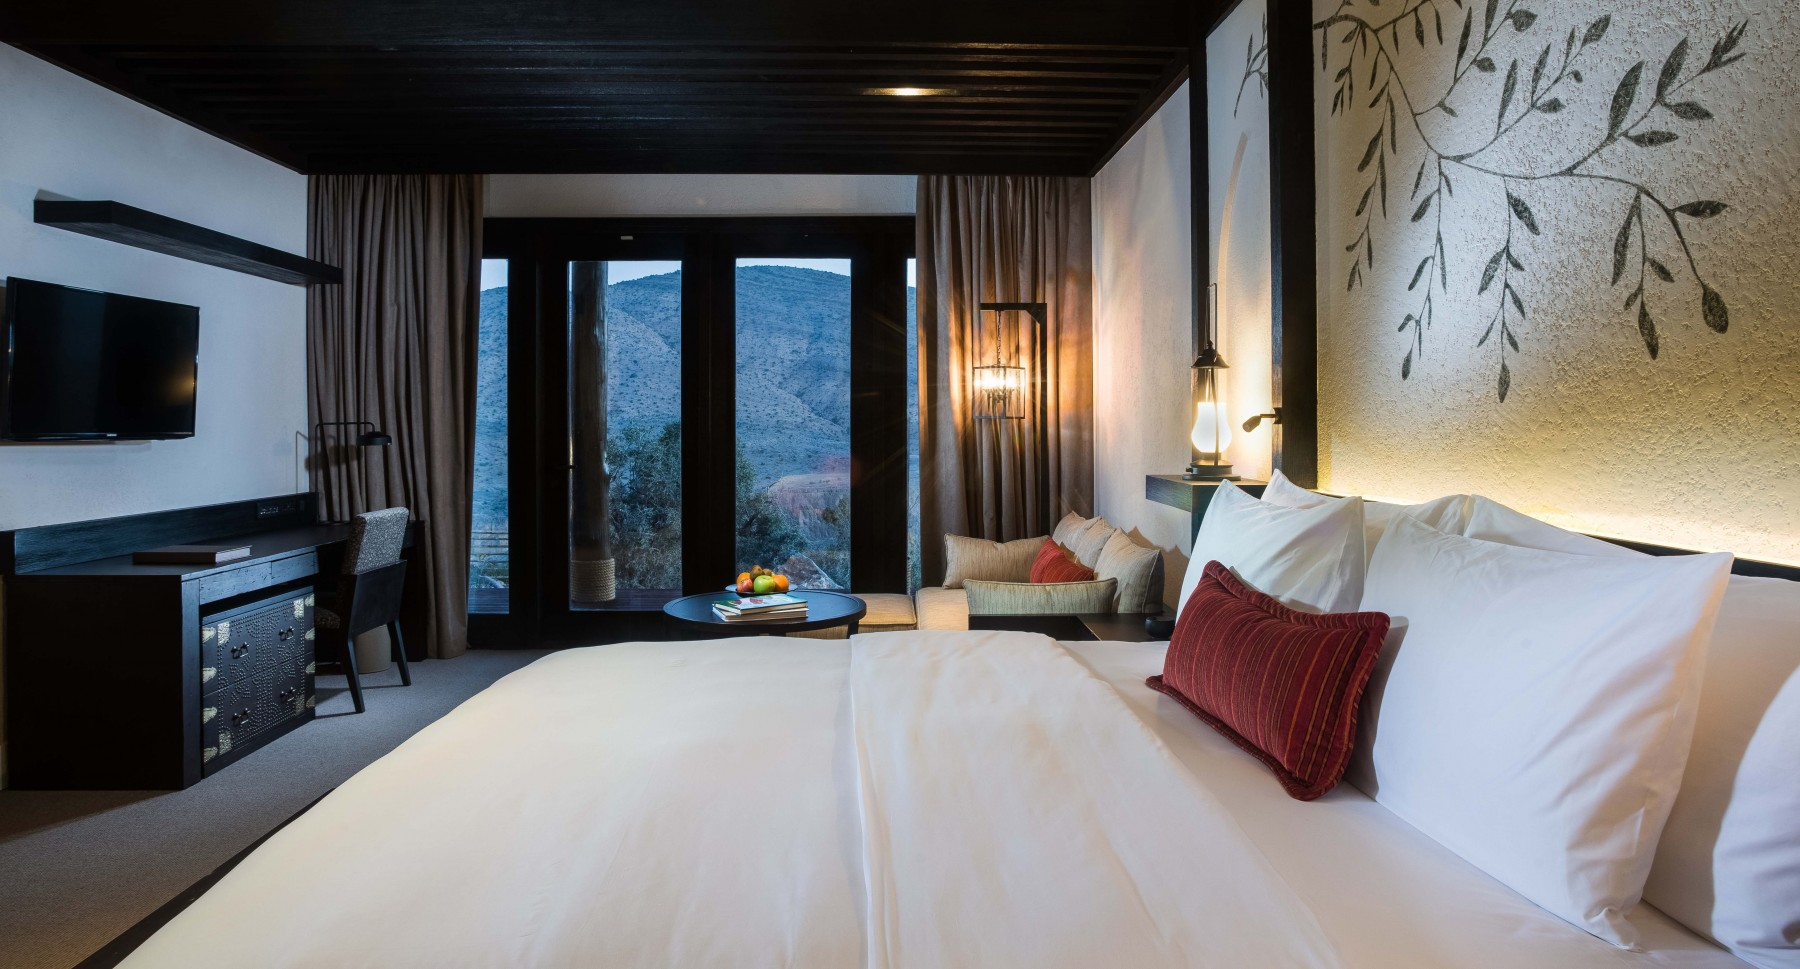 Alila-Jabal-Akhdar-Accommodation-Horizon-View-02